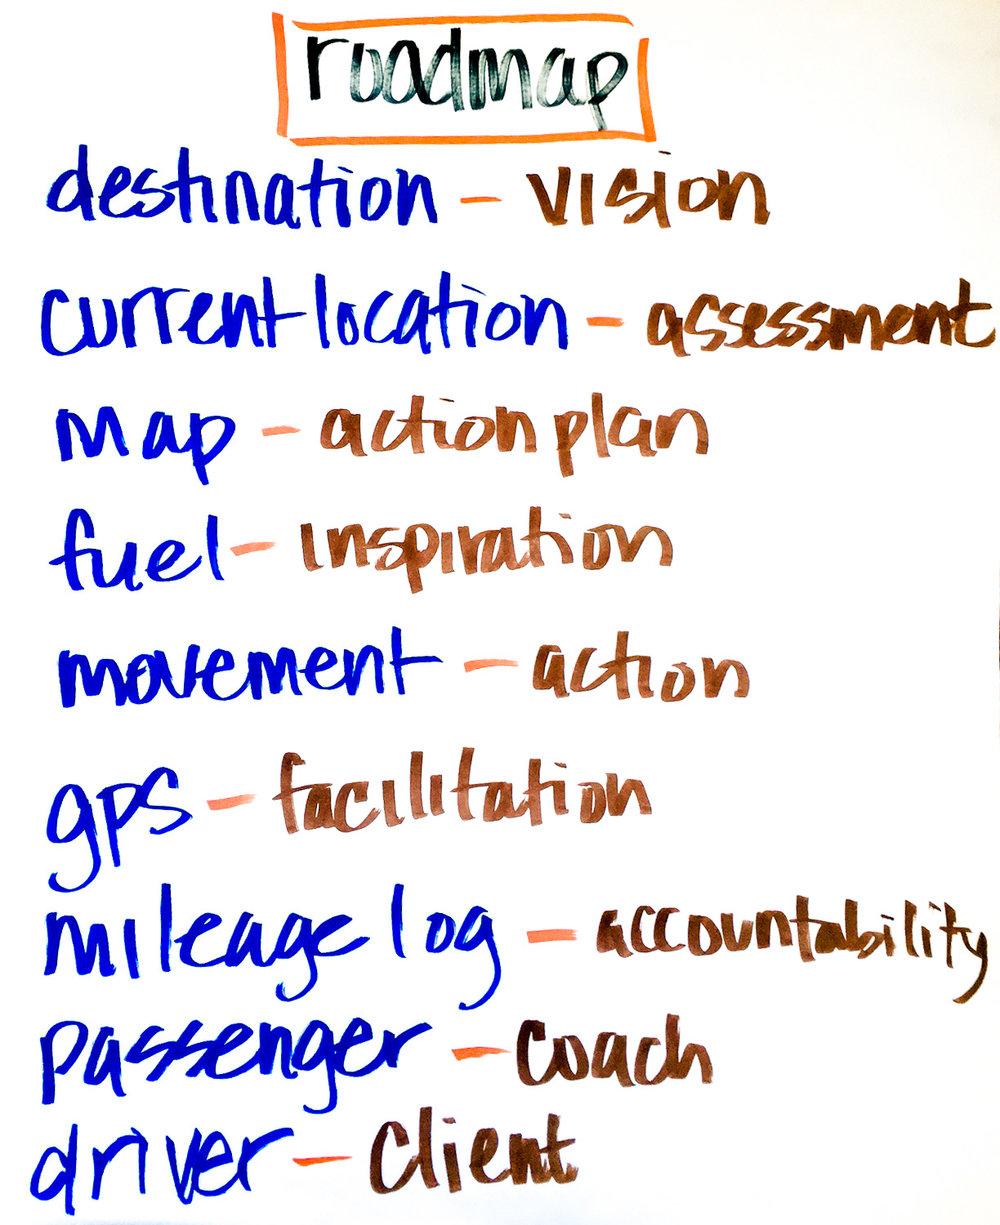 Roadmap Edited-2.jpg